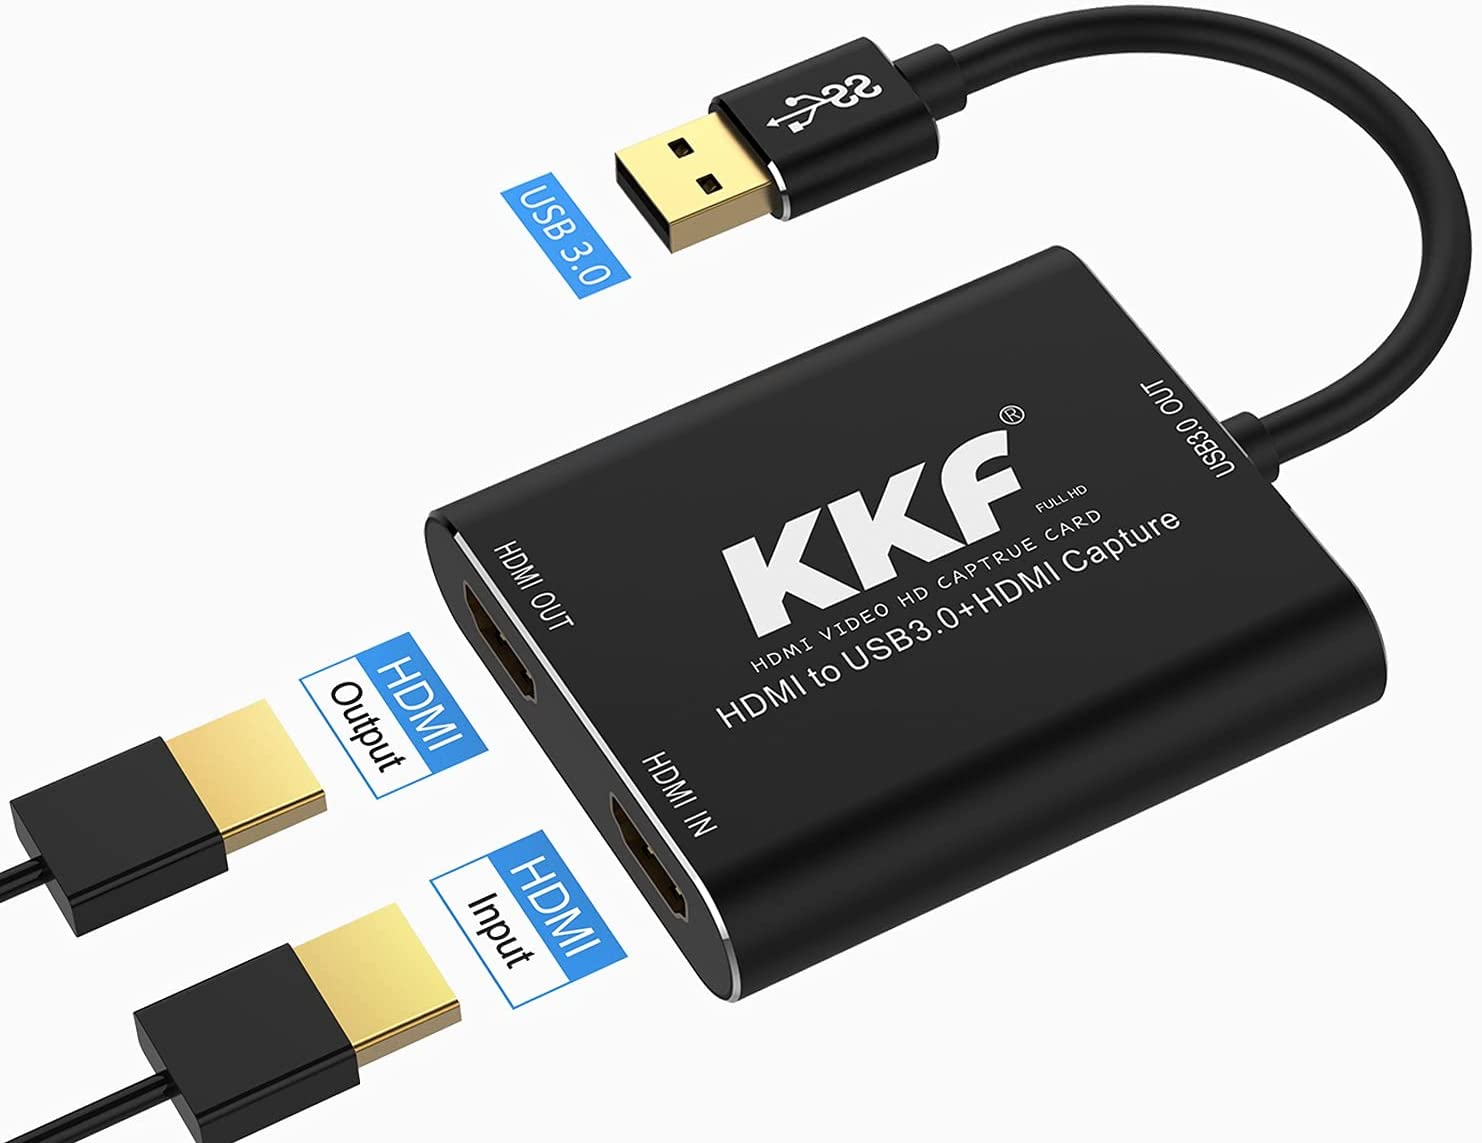 KKF USB3.0 1080P 60FPS HDMI Video Capture Card 4K $38.88 Coupon